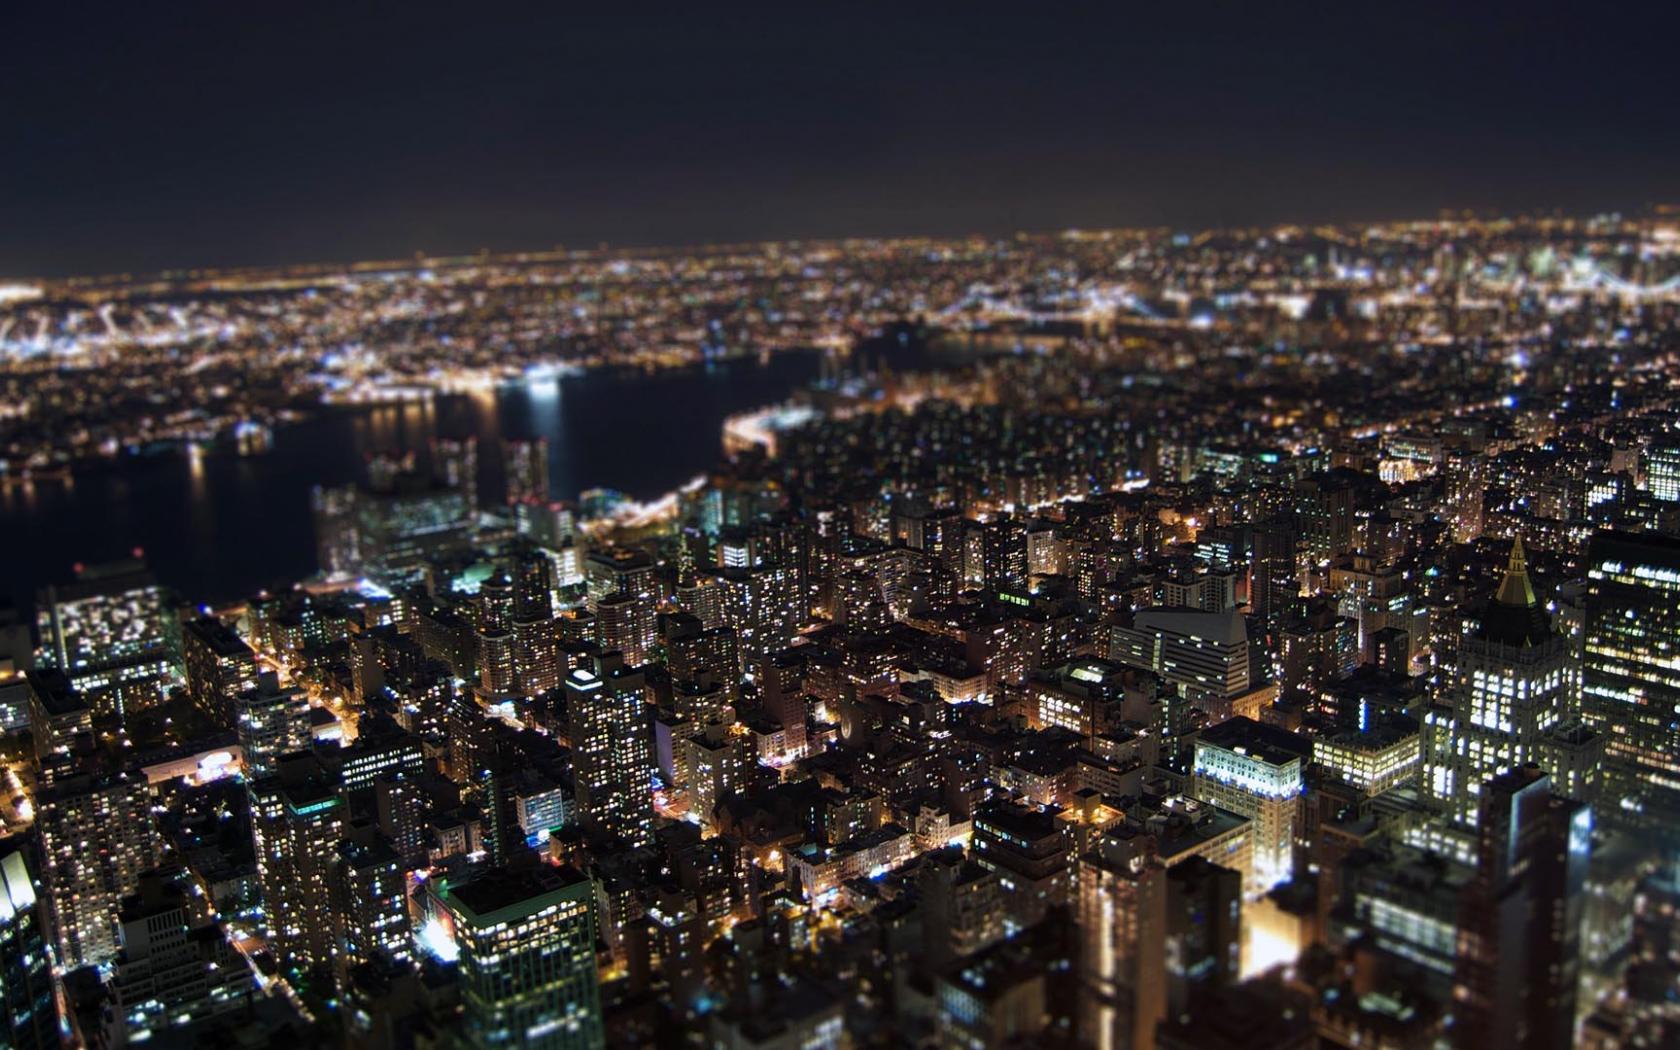 Free Download New York Night Hd Wallpaper Fullhdwpp Full Hd